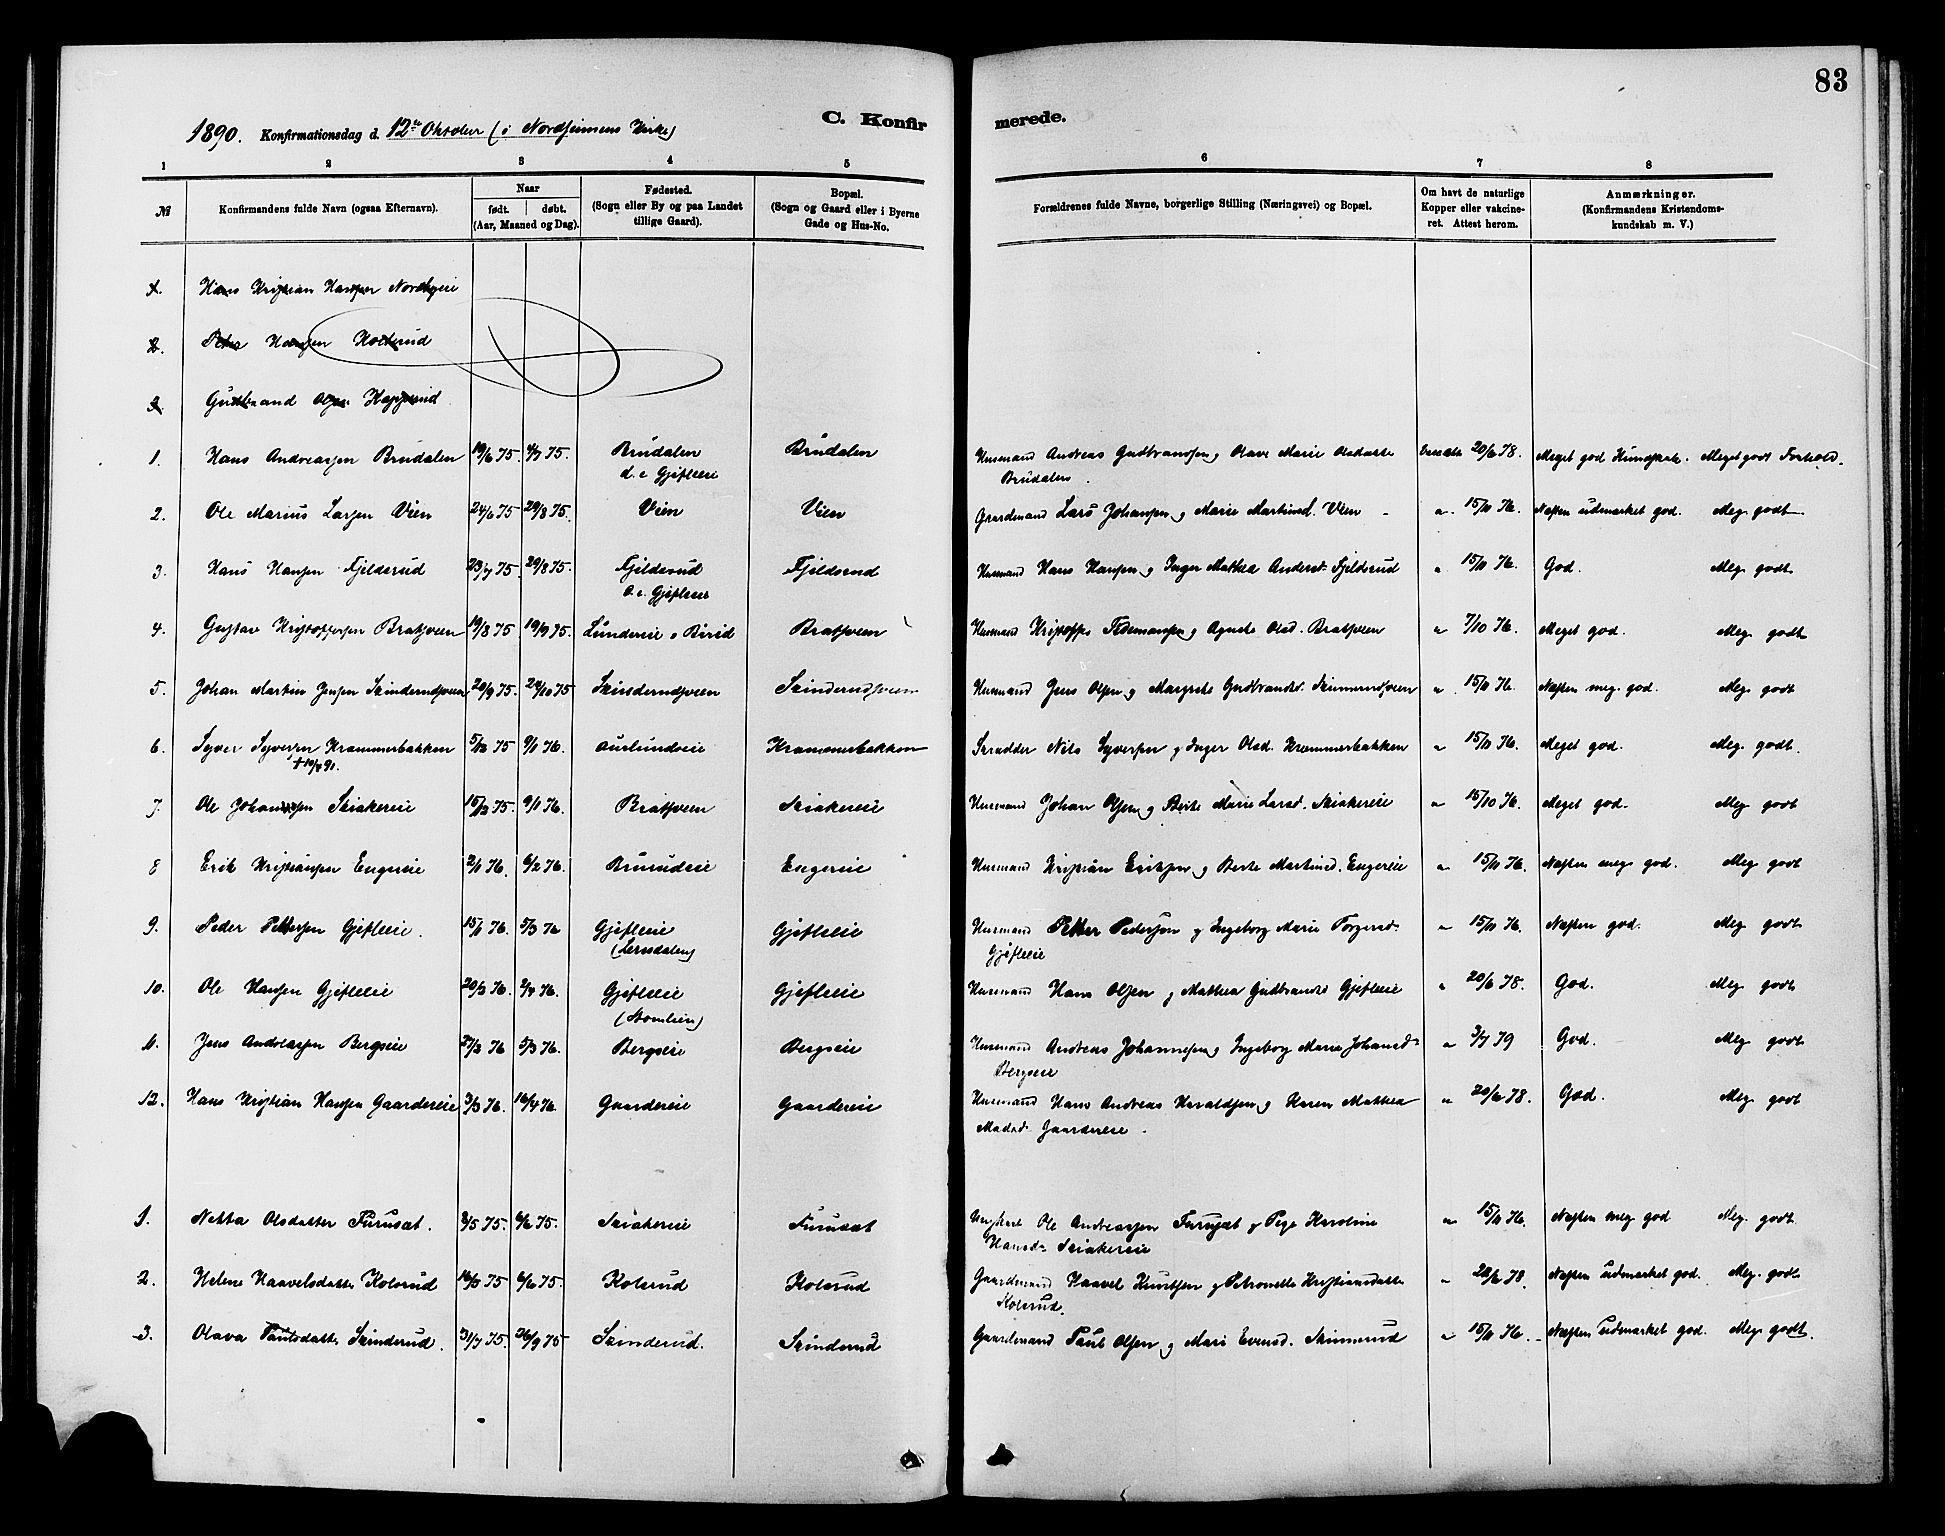 SAH, Nordre Land prestekontor, Ministerialbok nr. 3, 1882-1896, s. 83